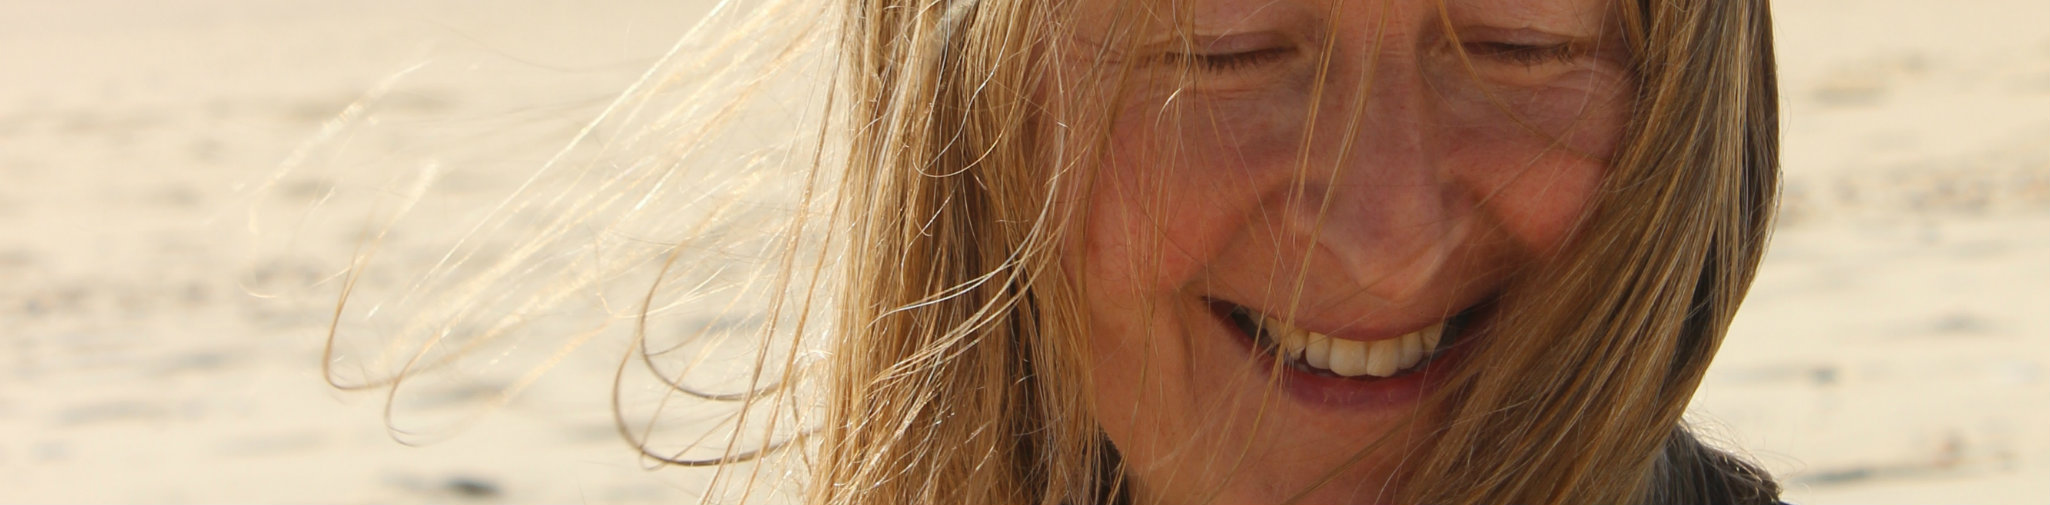 Beach girl 2 Portugal 2015.jpg